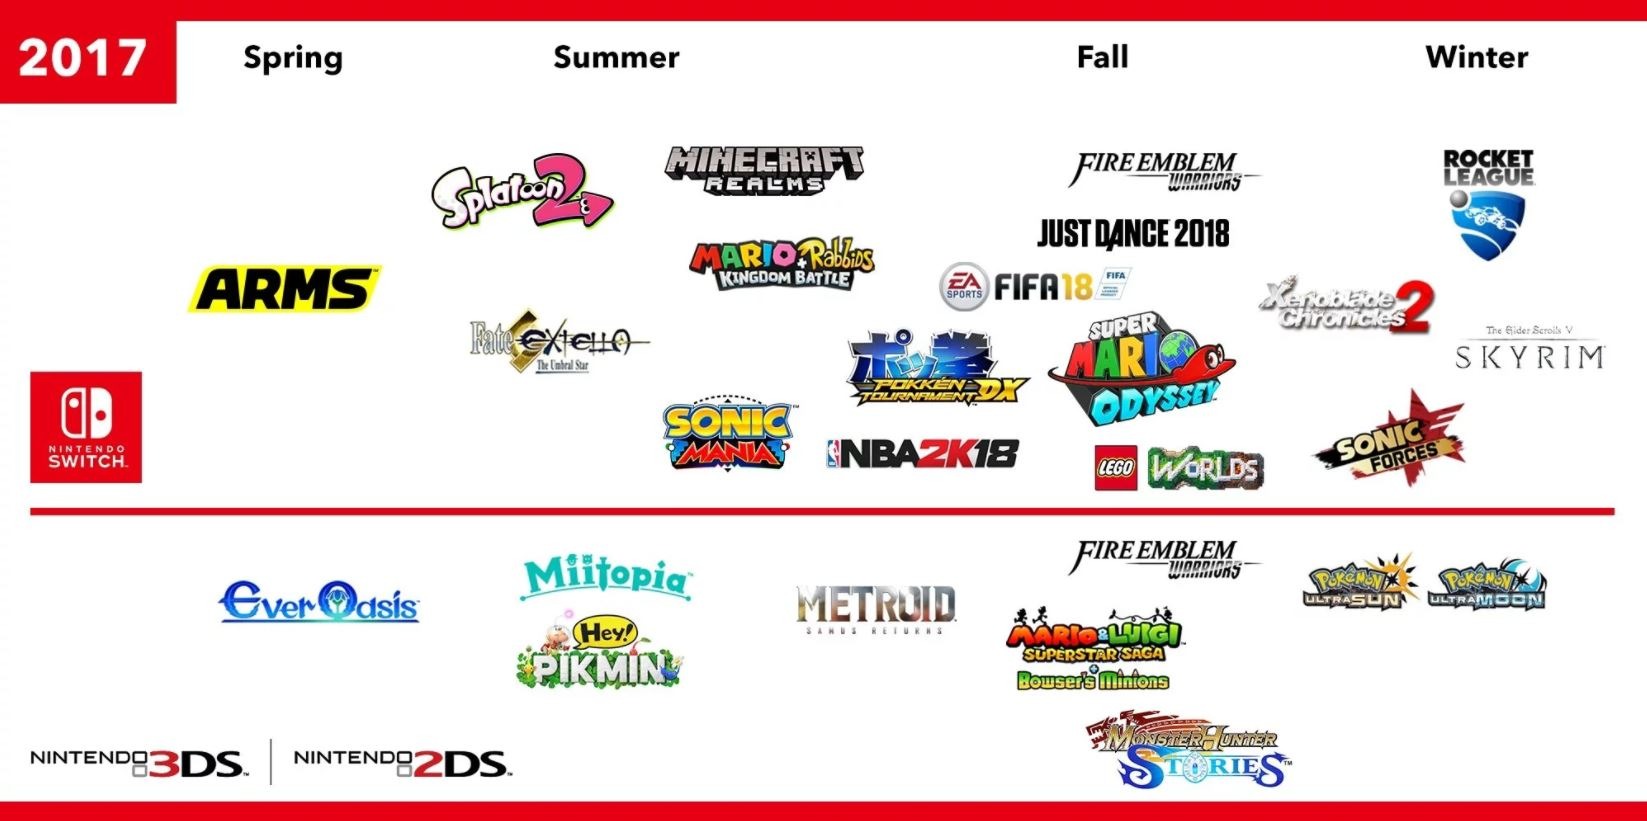 Nintendo Switch release schedule